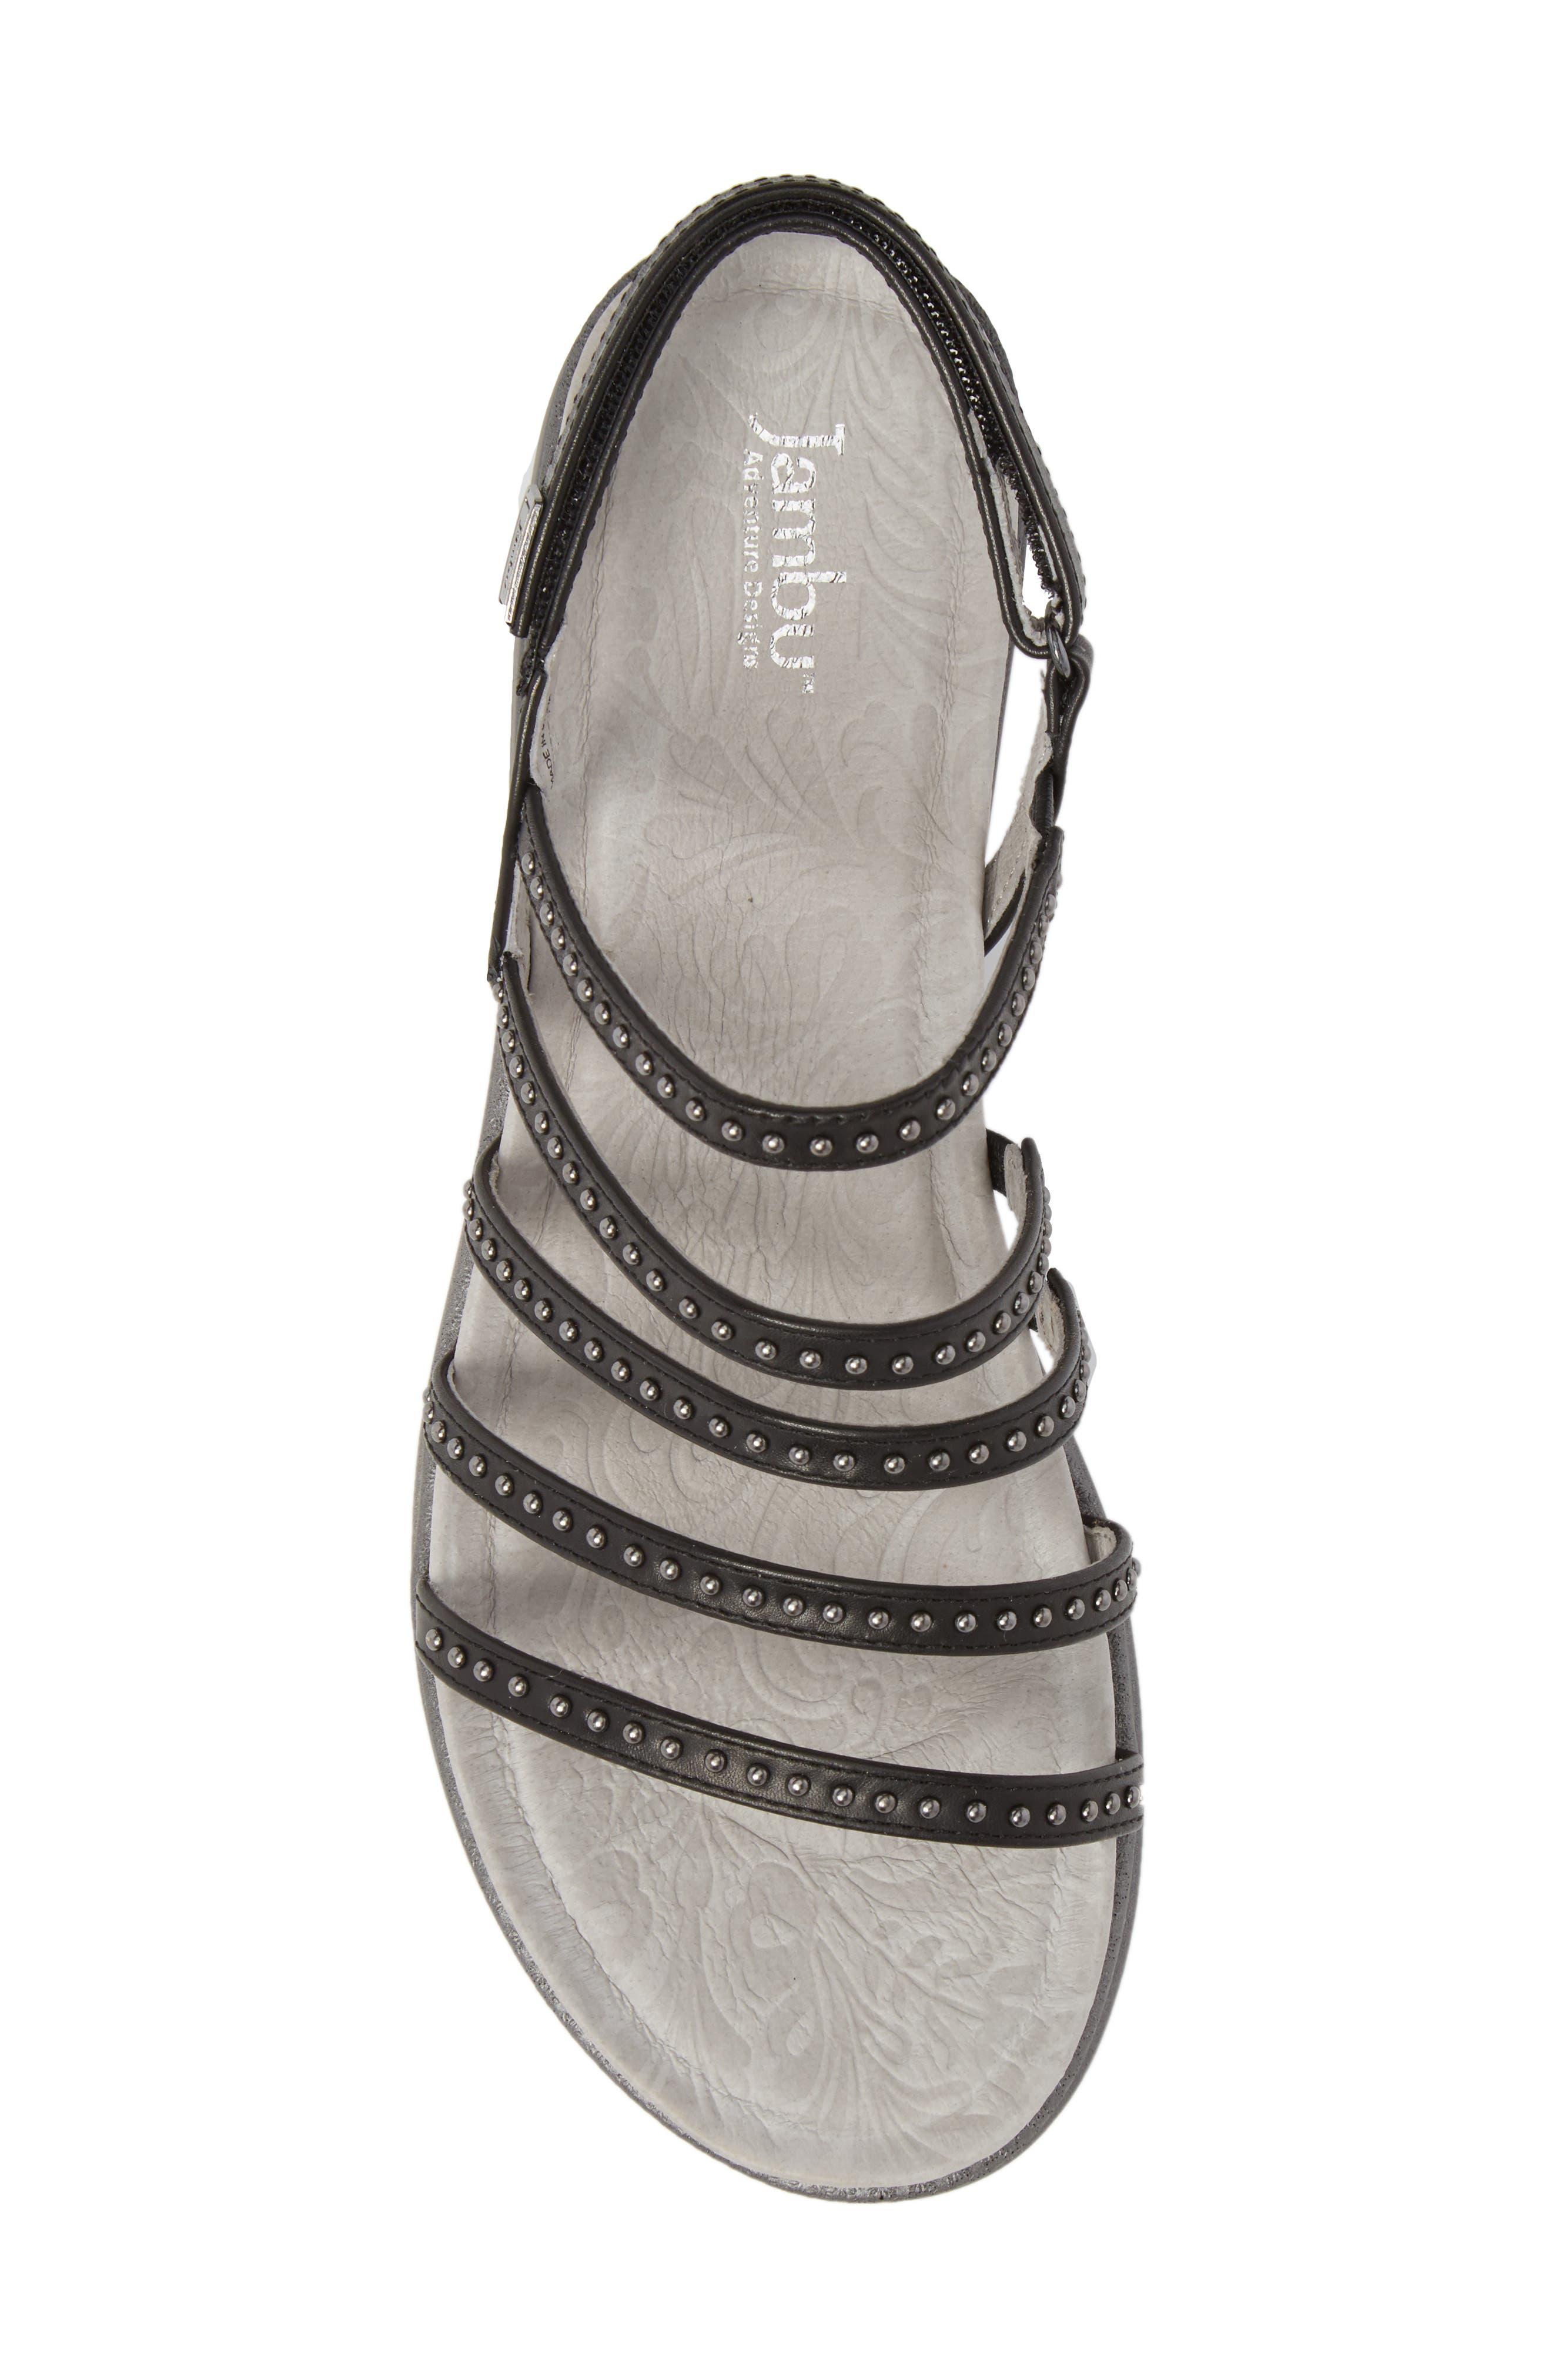 Elegance Studded Strappy Sandal,                             Alternate thumbnail 5, color,                             BLACK LEATHER